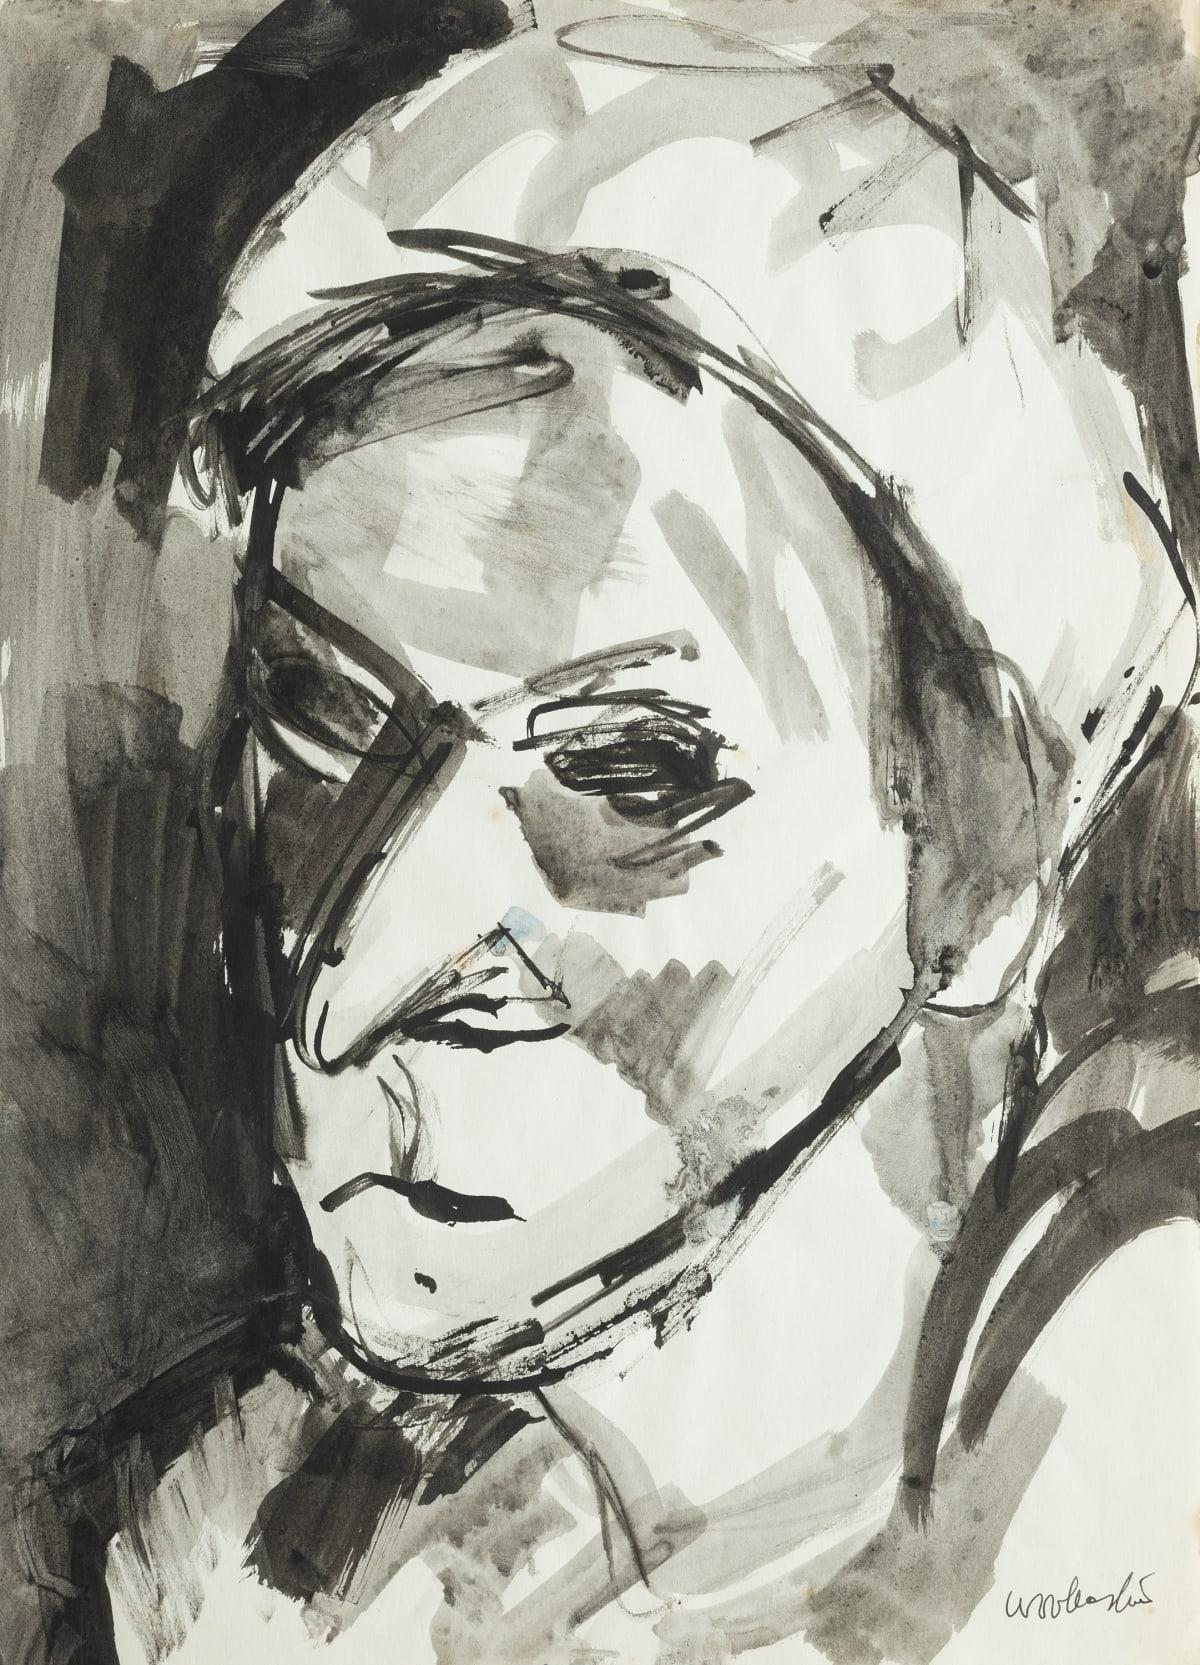 Mountford Tosswill Woollaston Mrs Manson, Takaka, 1961 ink on paper 375mm x 275mm